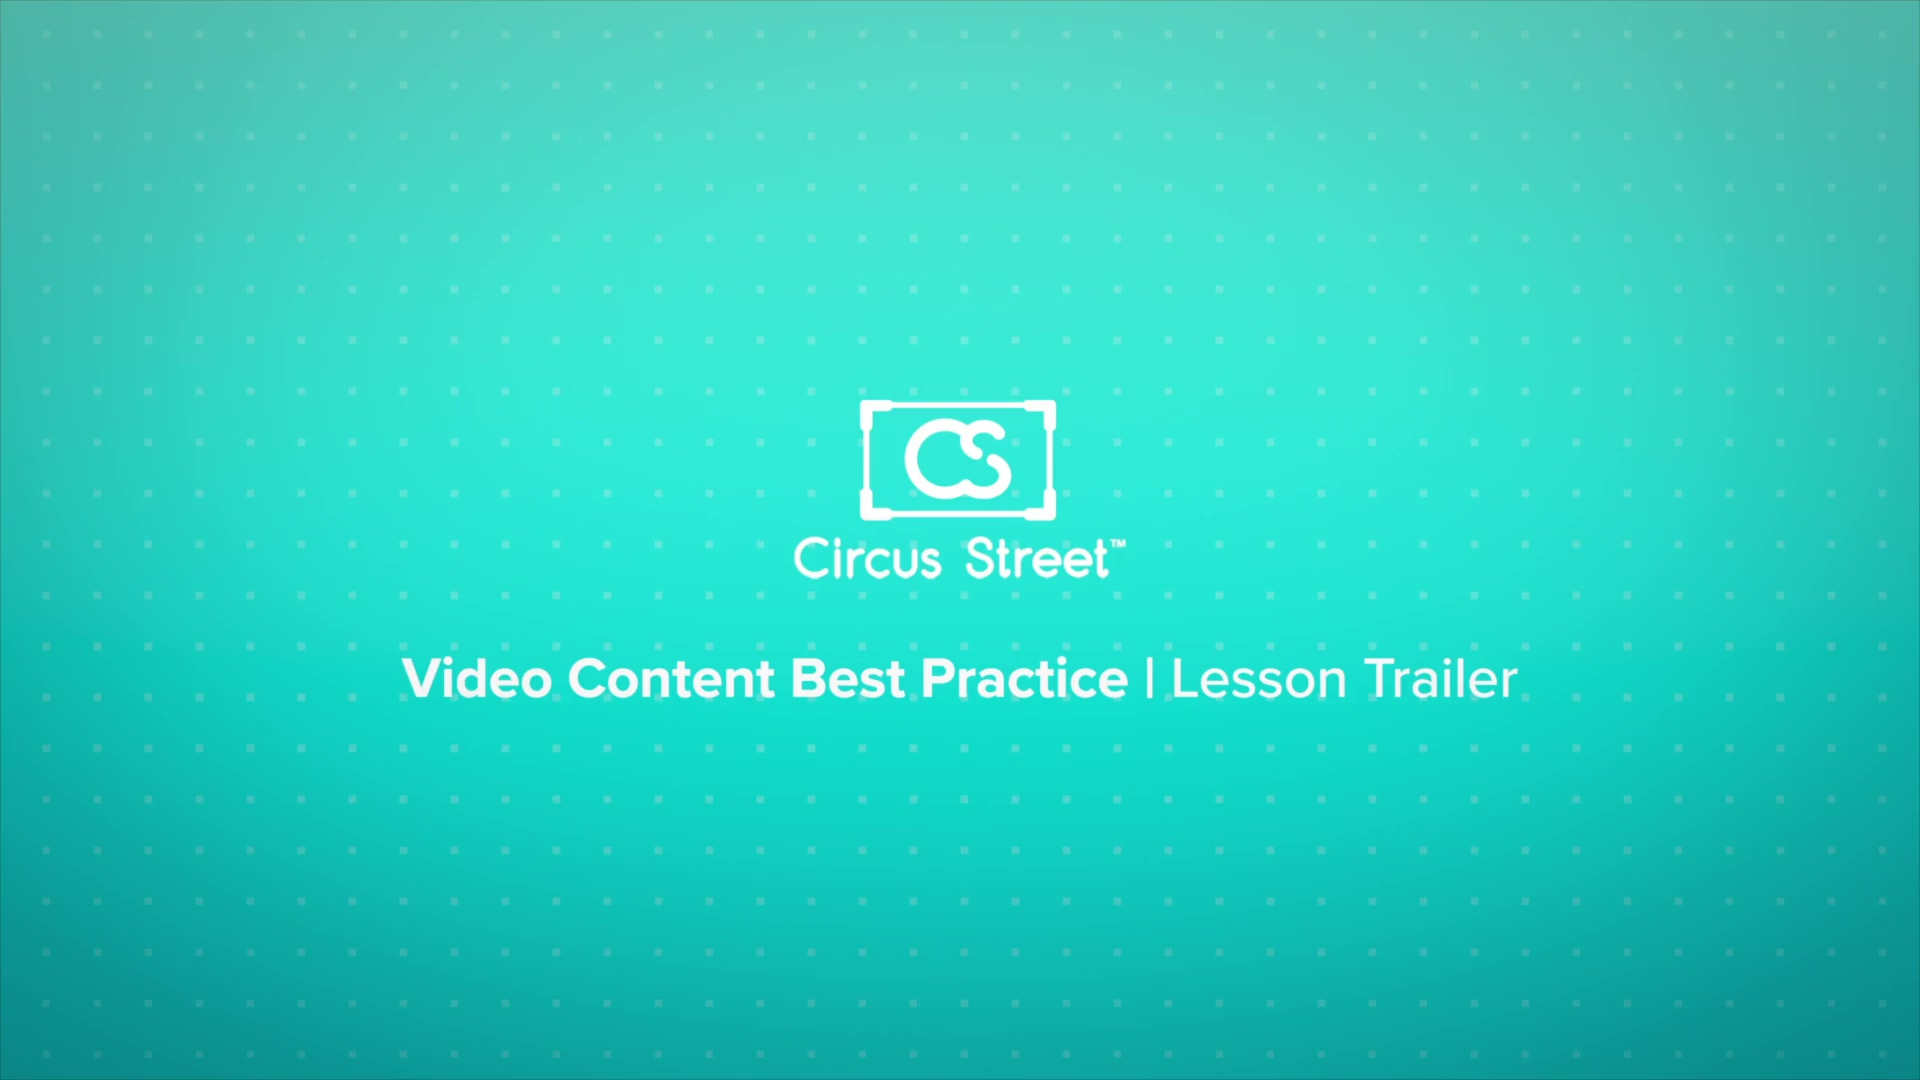 Video Content Trailer